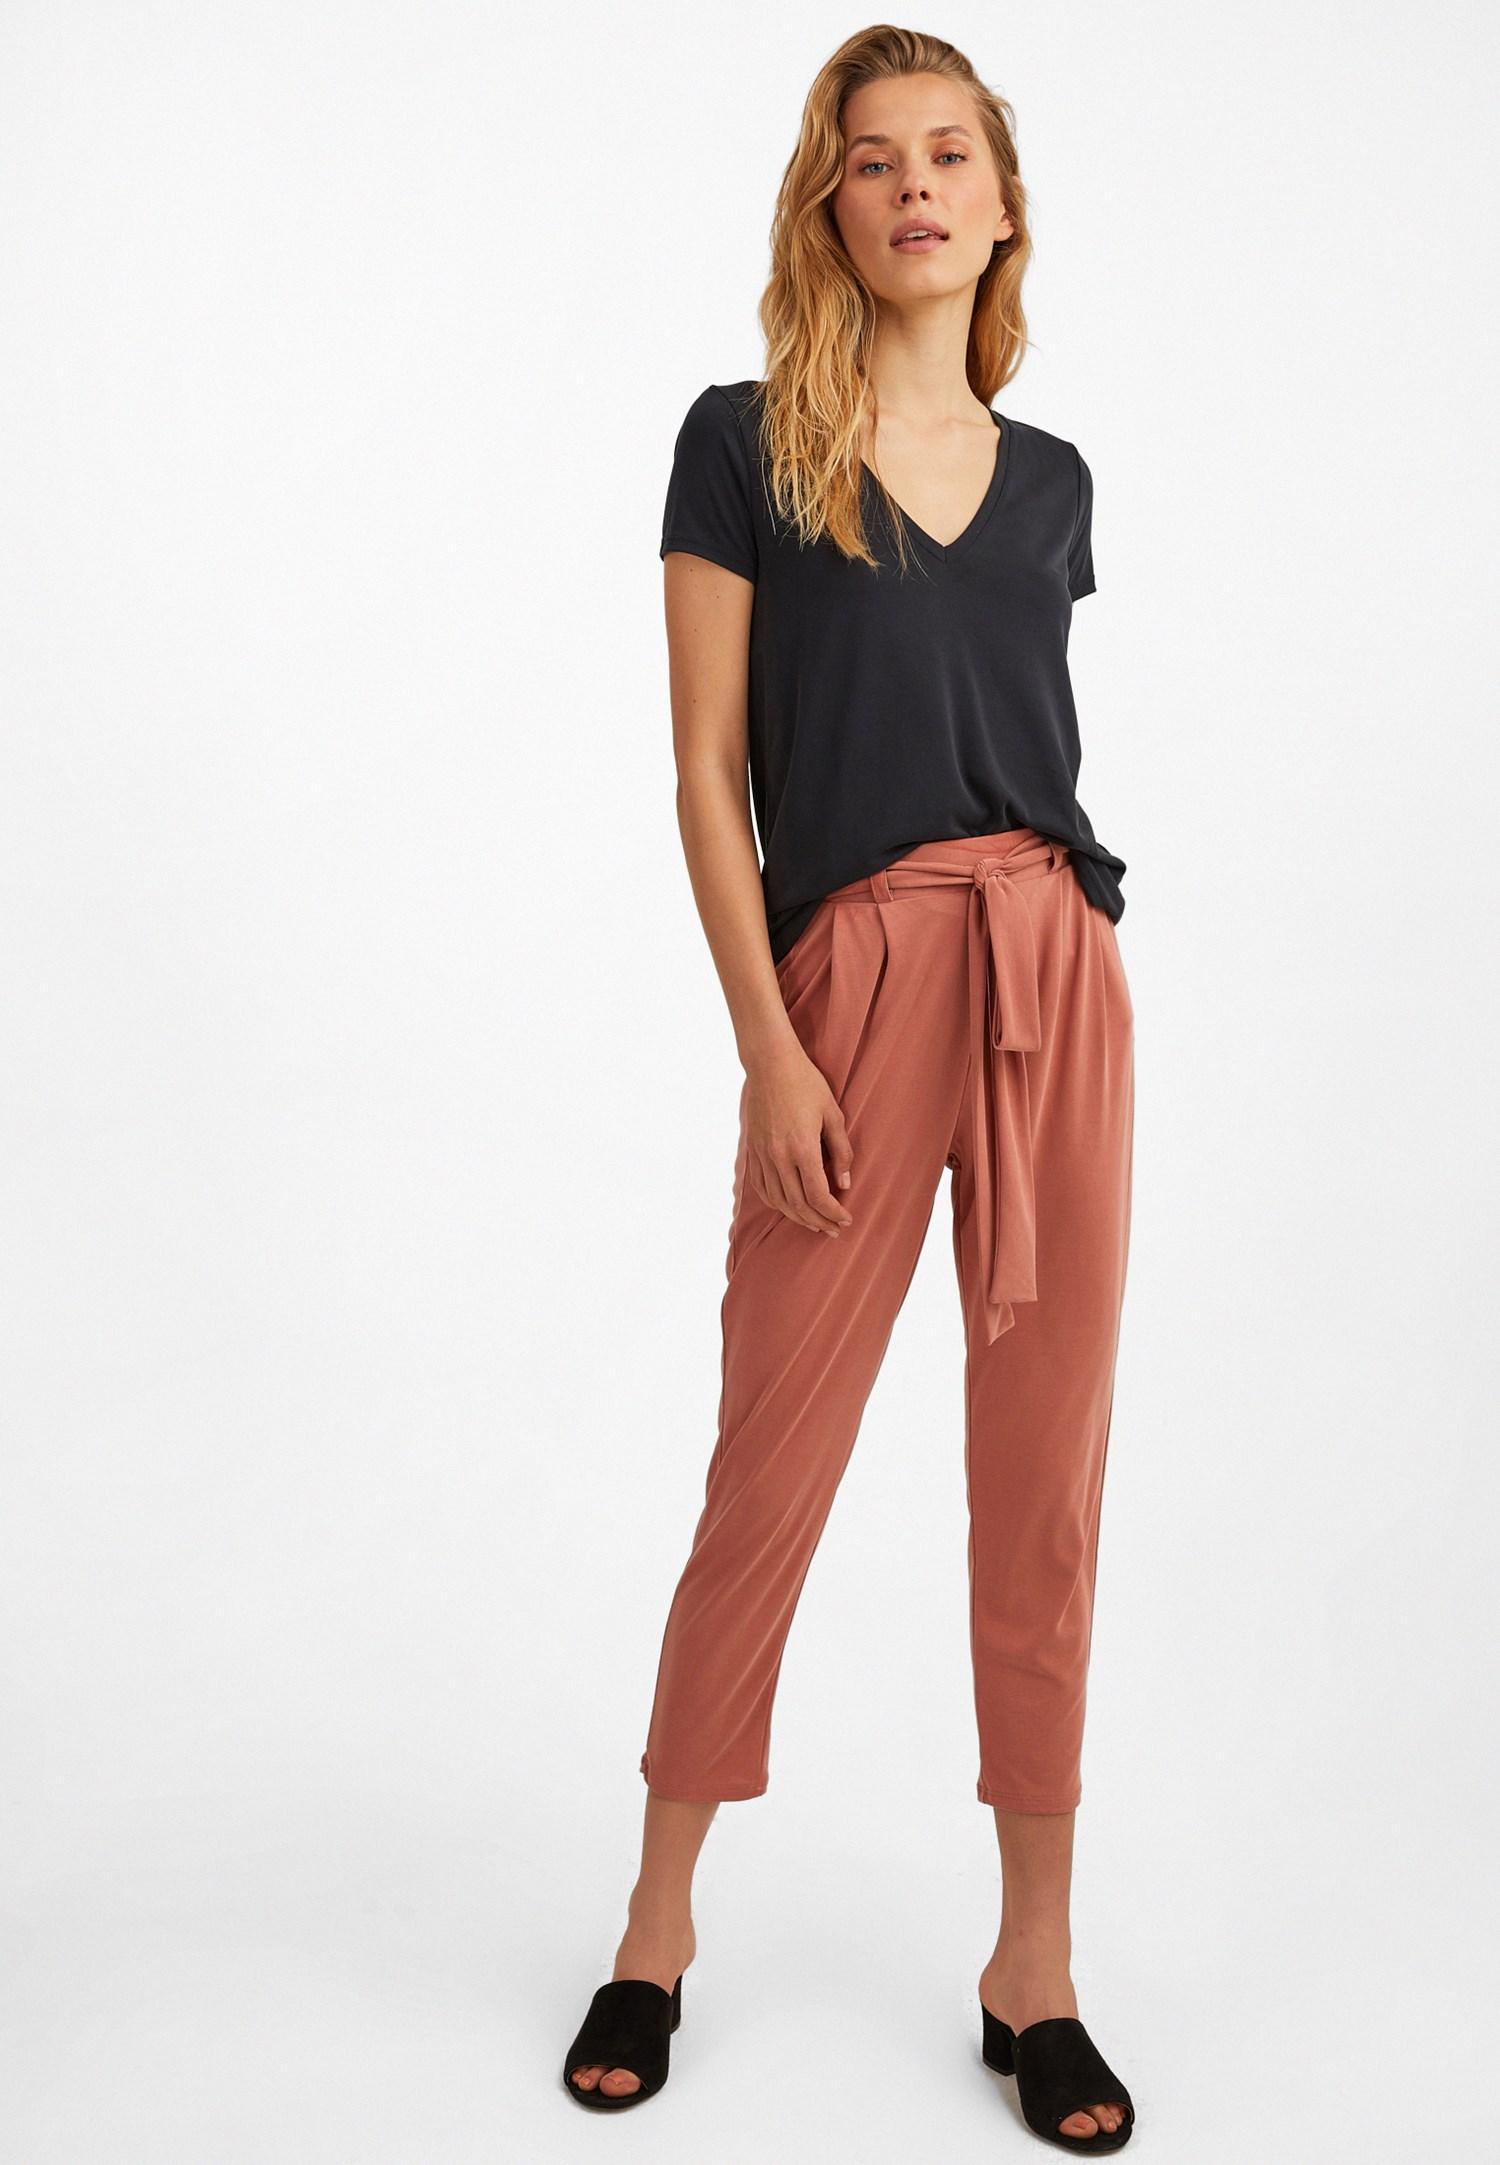 Bayan Turuncu Yumuşak Dokulu Orta Bel Pantolon